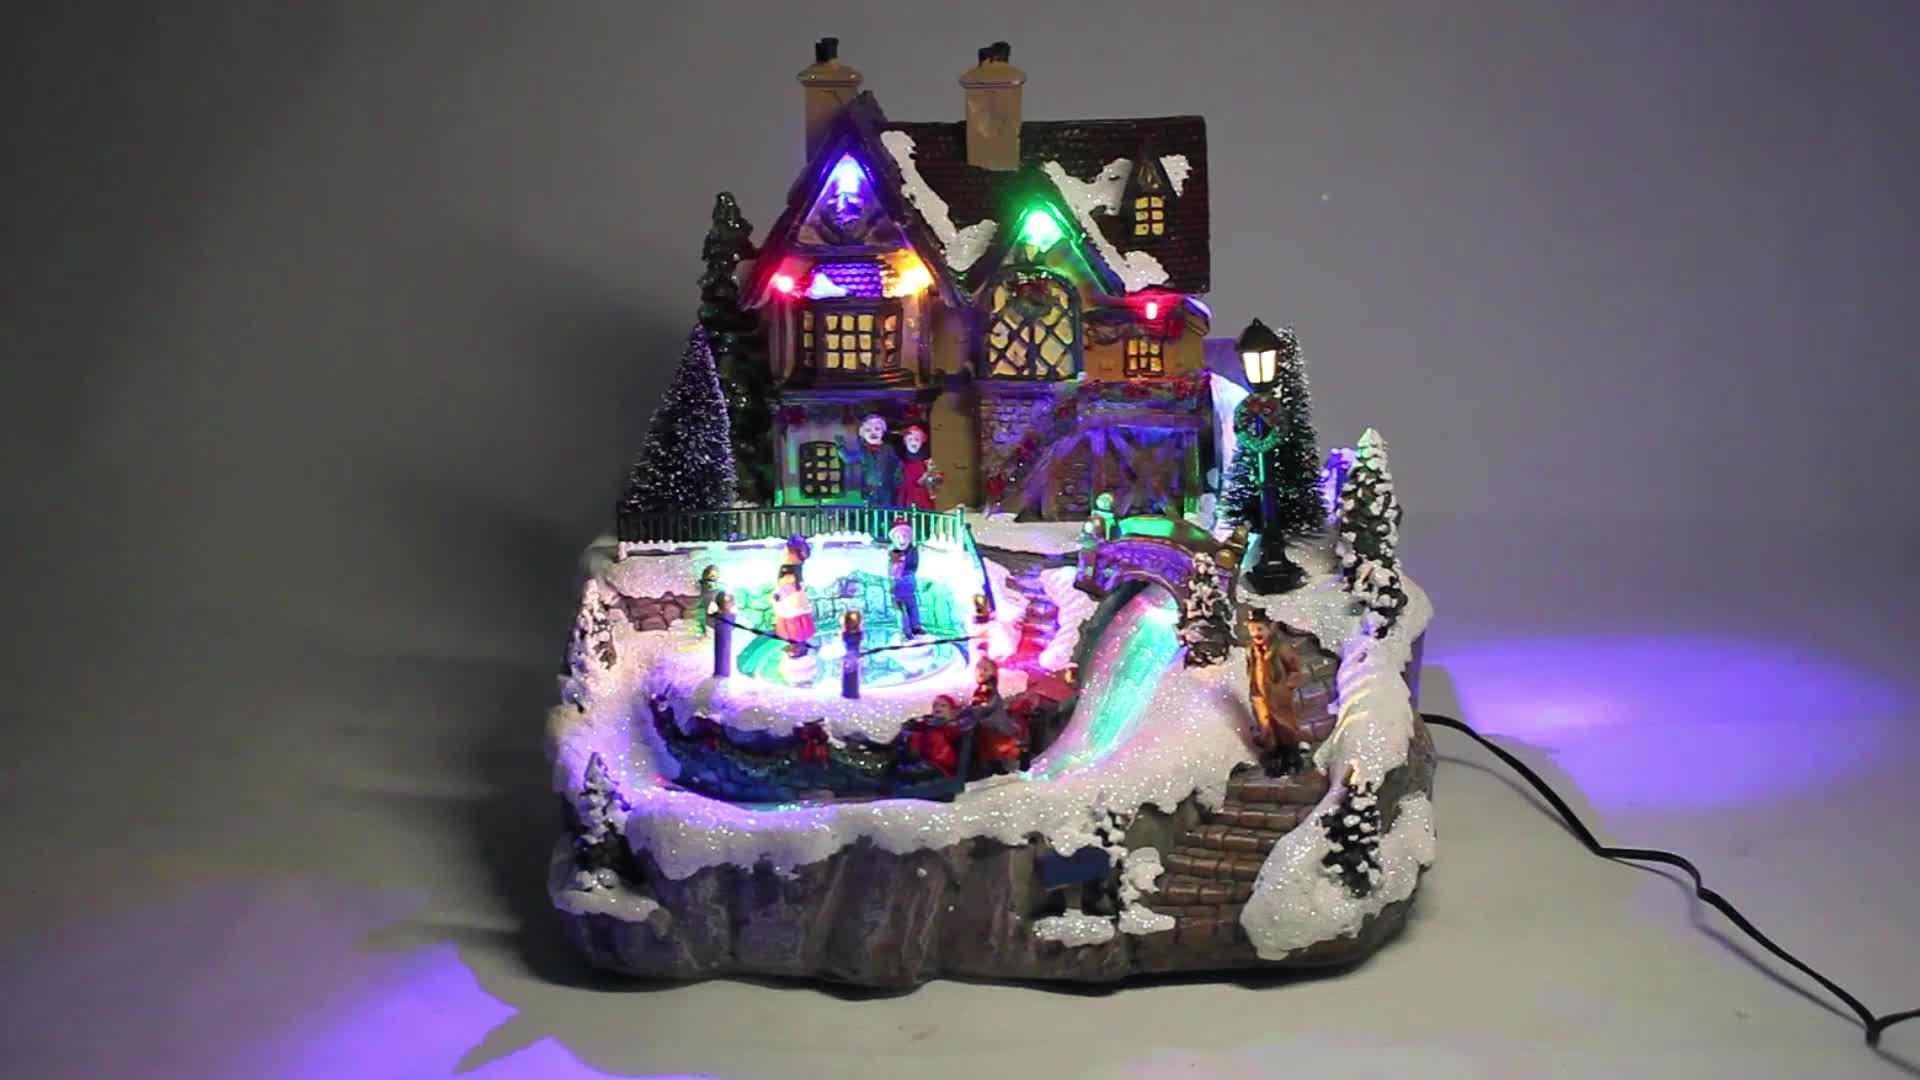 Custom Noel Polyresin led de musical decor people fiber optic ILLUMINATED Magic Christmas village houses with Adaptors